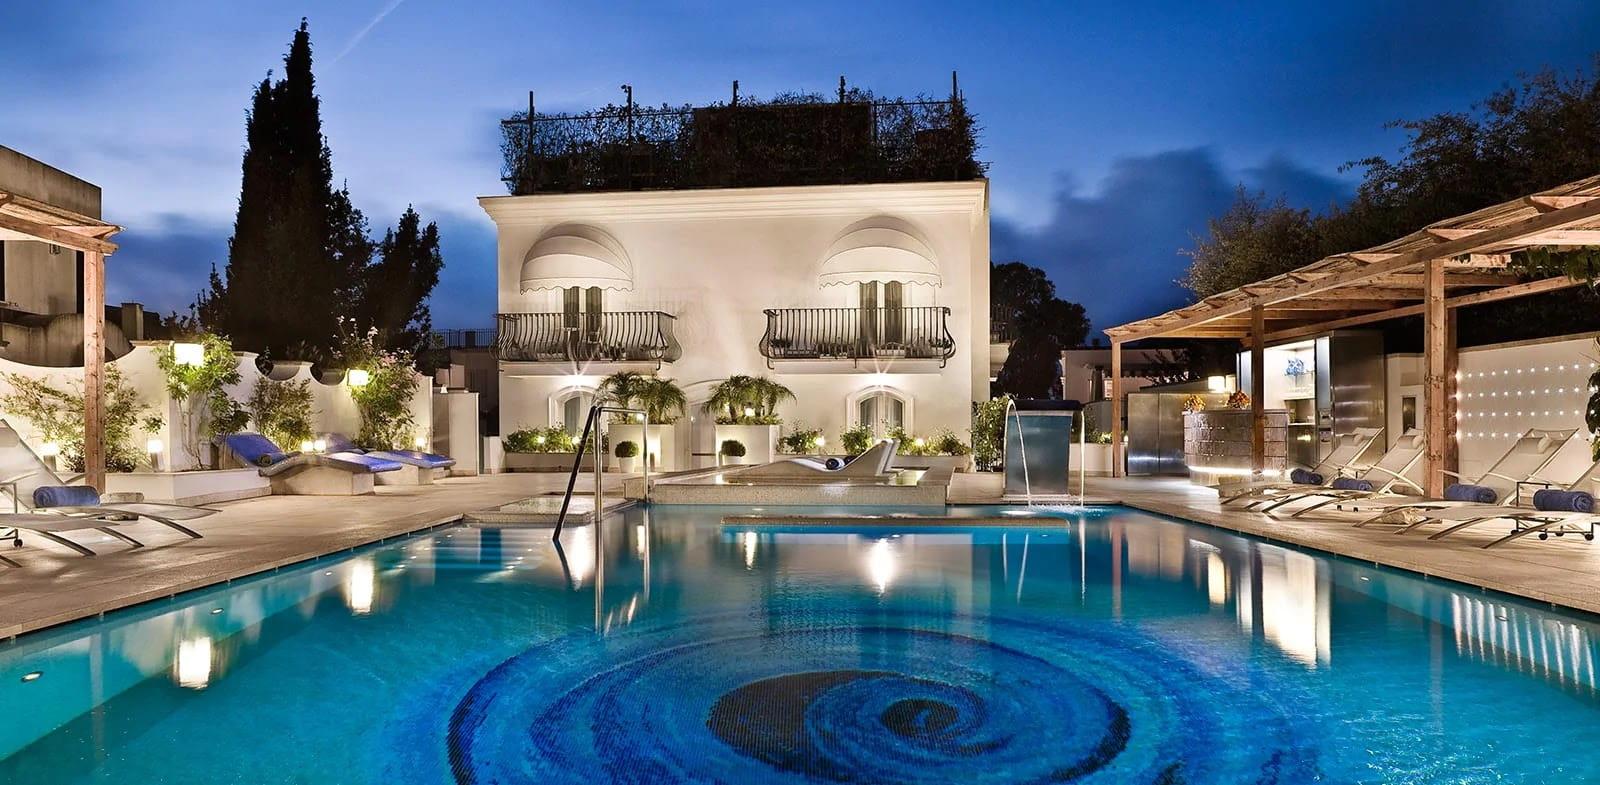 hotelvillablucapri